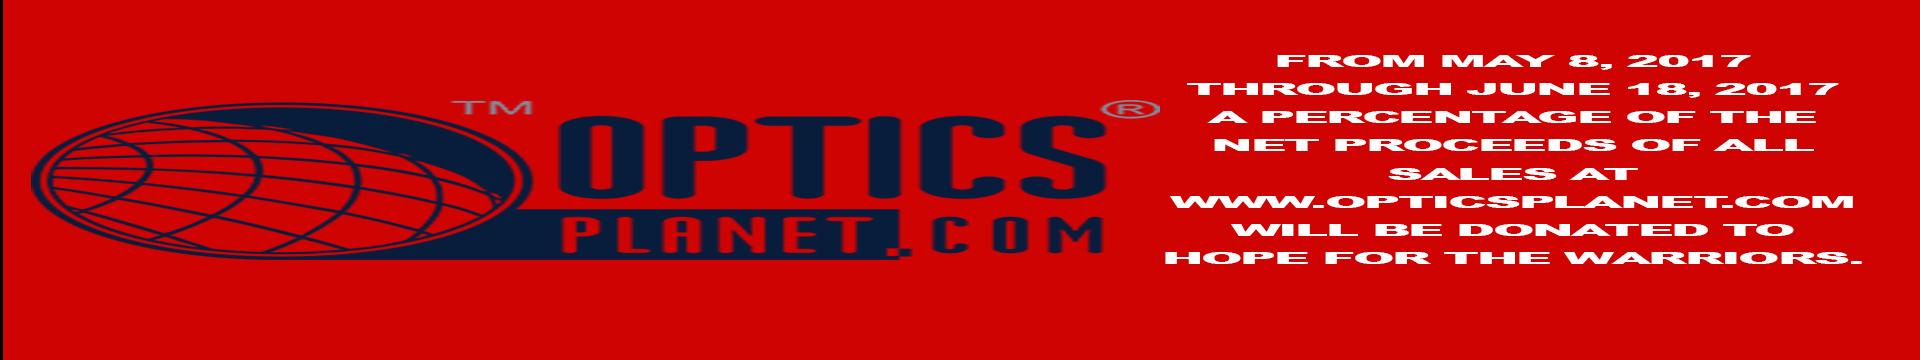 Optics Planet Promo